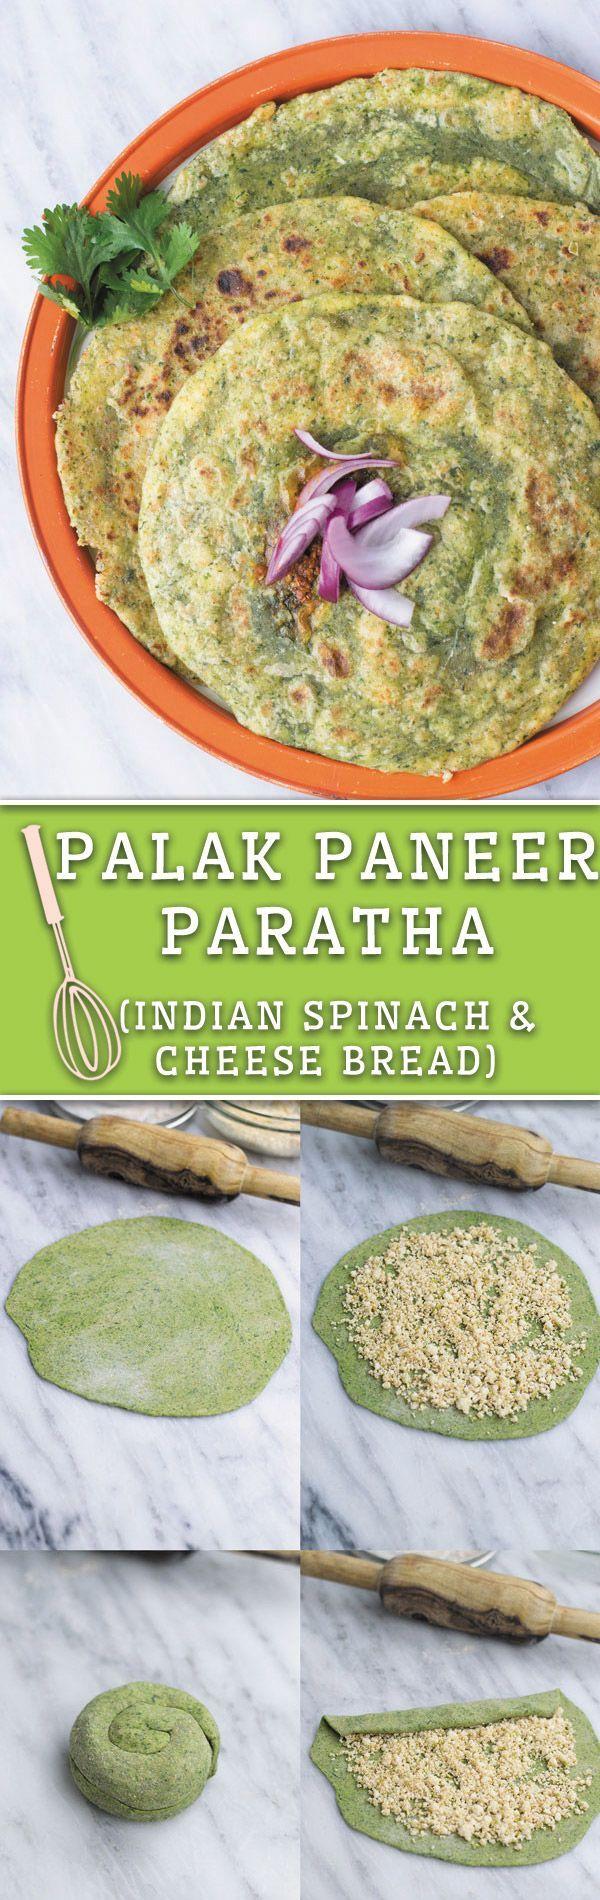 Palak Paneer Paratha - Indian Spinach Cheese Flatbread